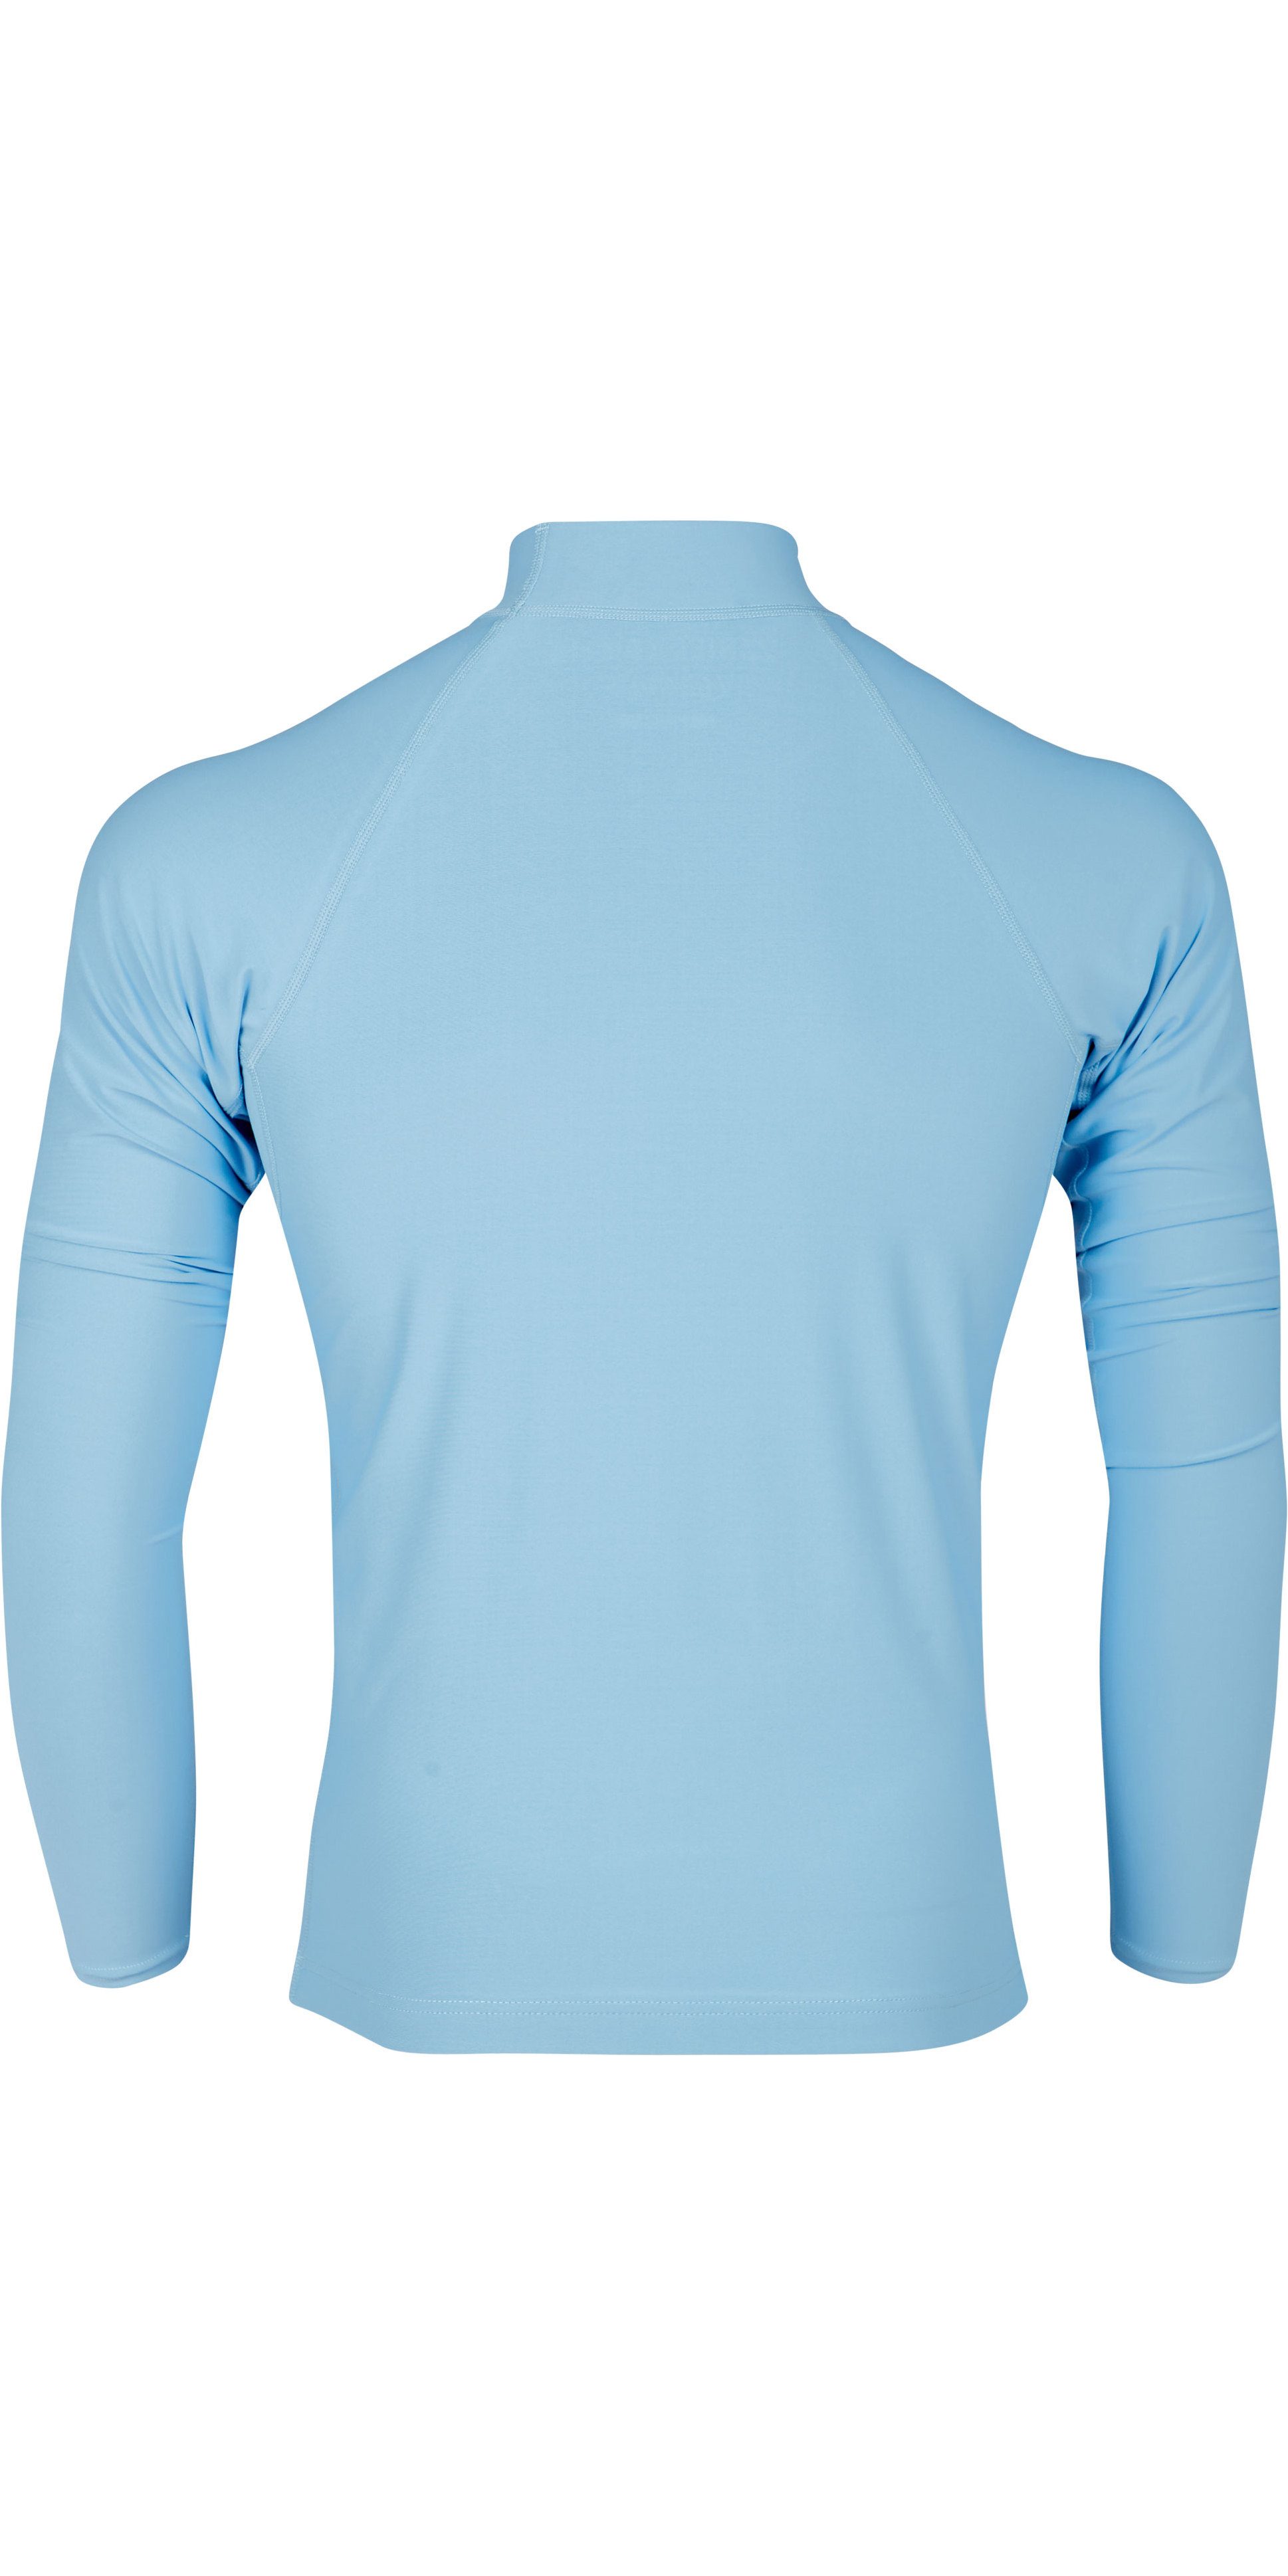 2019 Billabong Mens Unity Long Sleeve Printed Rash Vest Aqua Blue N4MY06